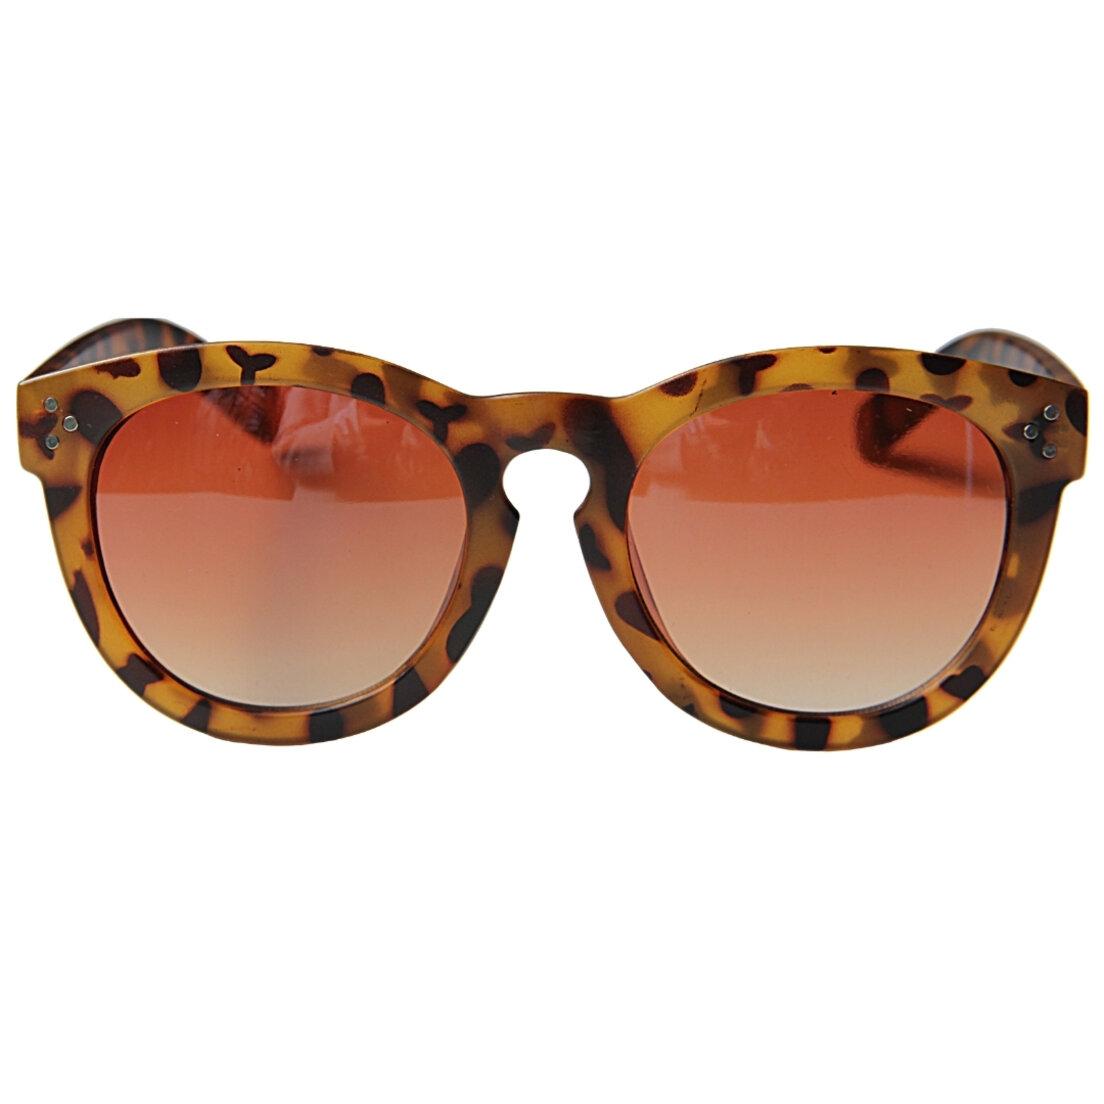 OUTLET - Óculos de Sol KhattoRound Young Mary Italiano